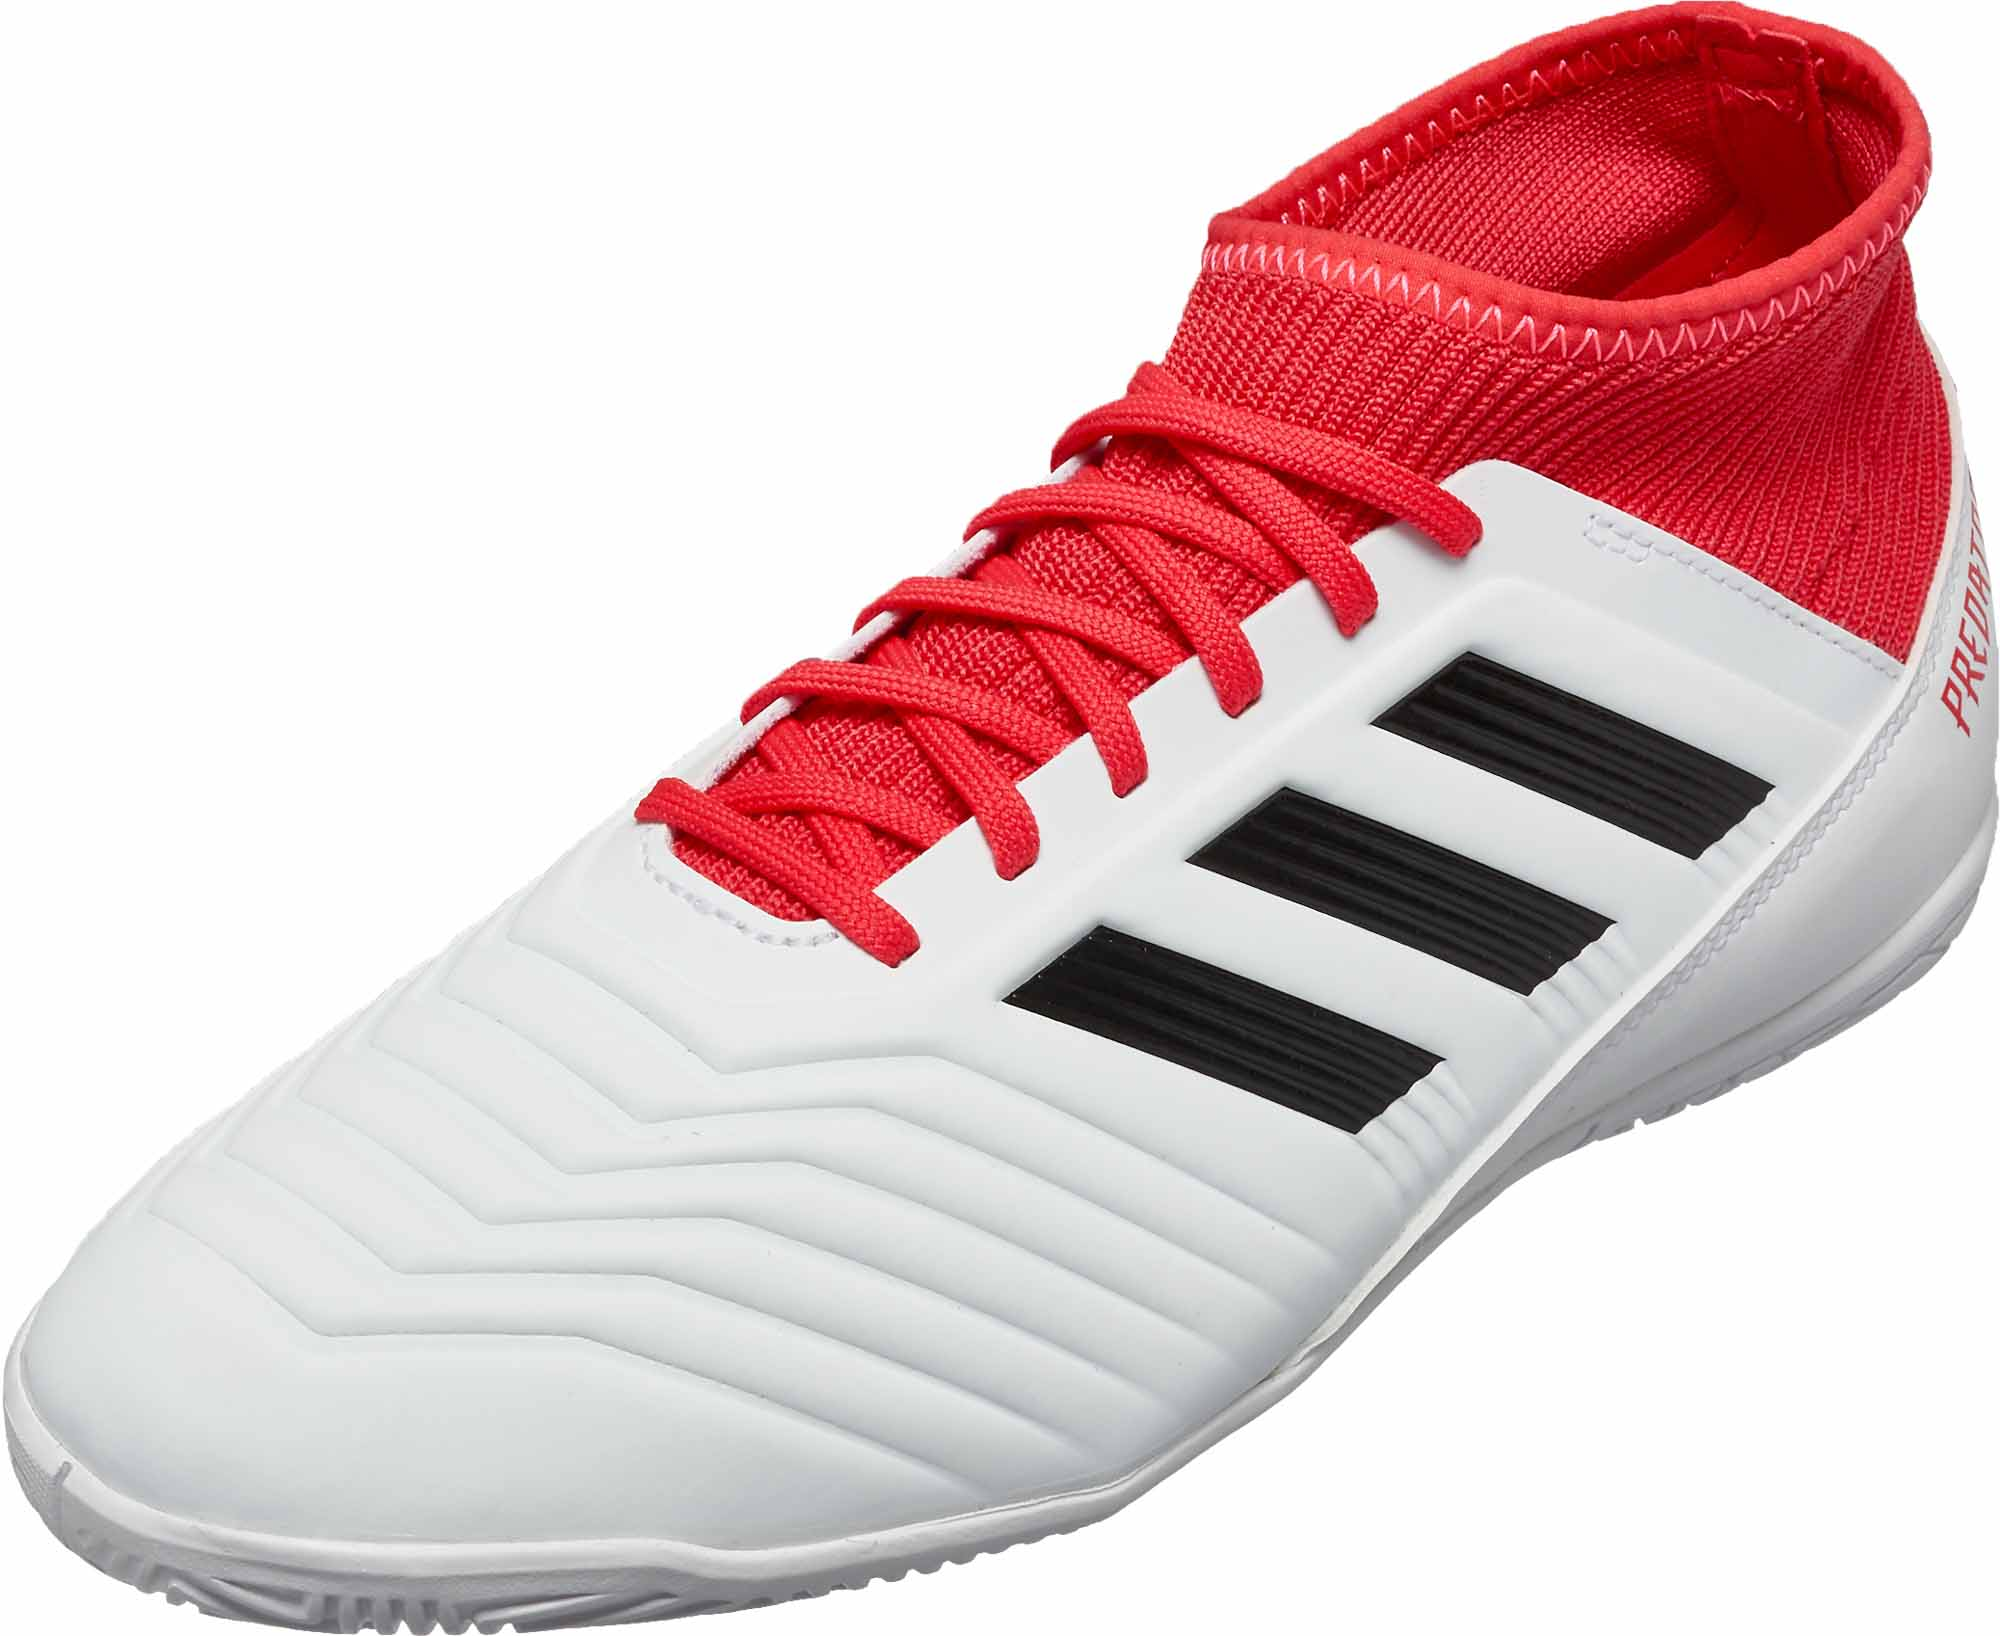 c0e59198c8b7 adidas Kids Predator Tango 18.3 IN - White   Real Coral - Soccer Master